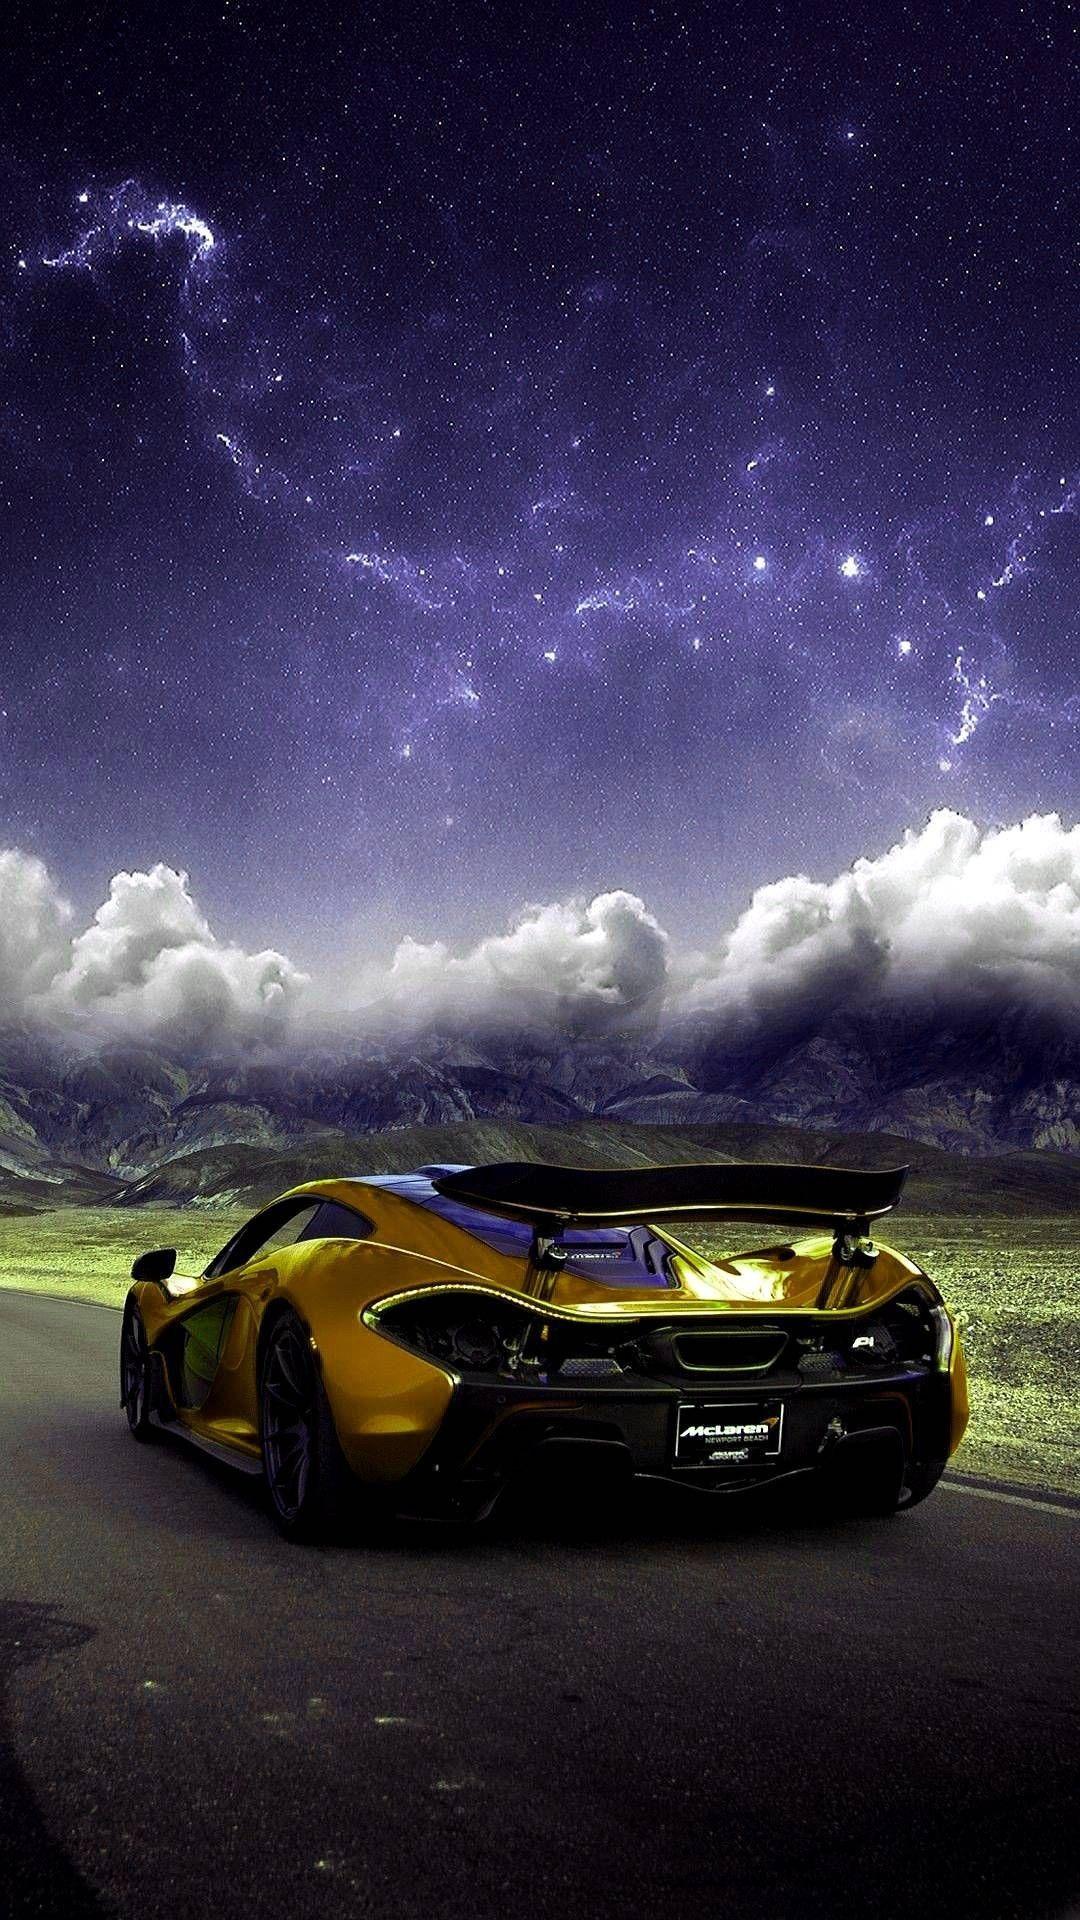 Super Carz In 2020 Mclaren Cars Car Iphone Wallpaper Sports Car Wallpaper